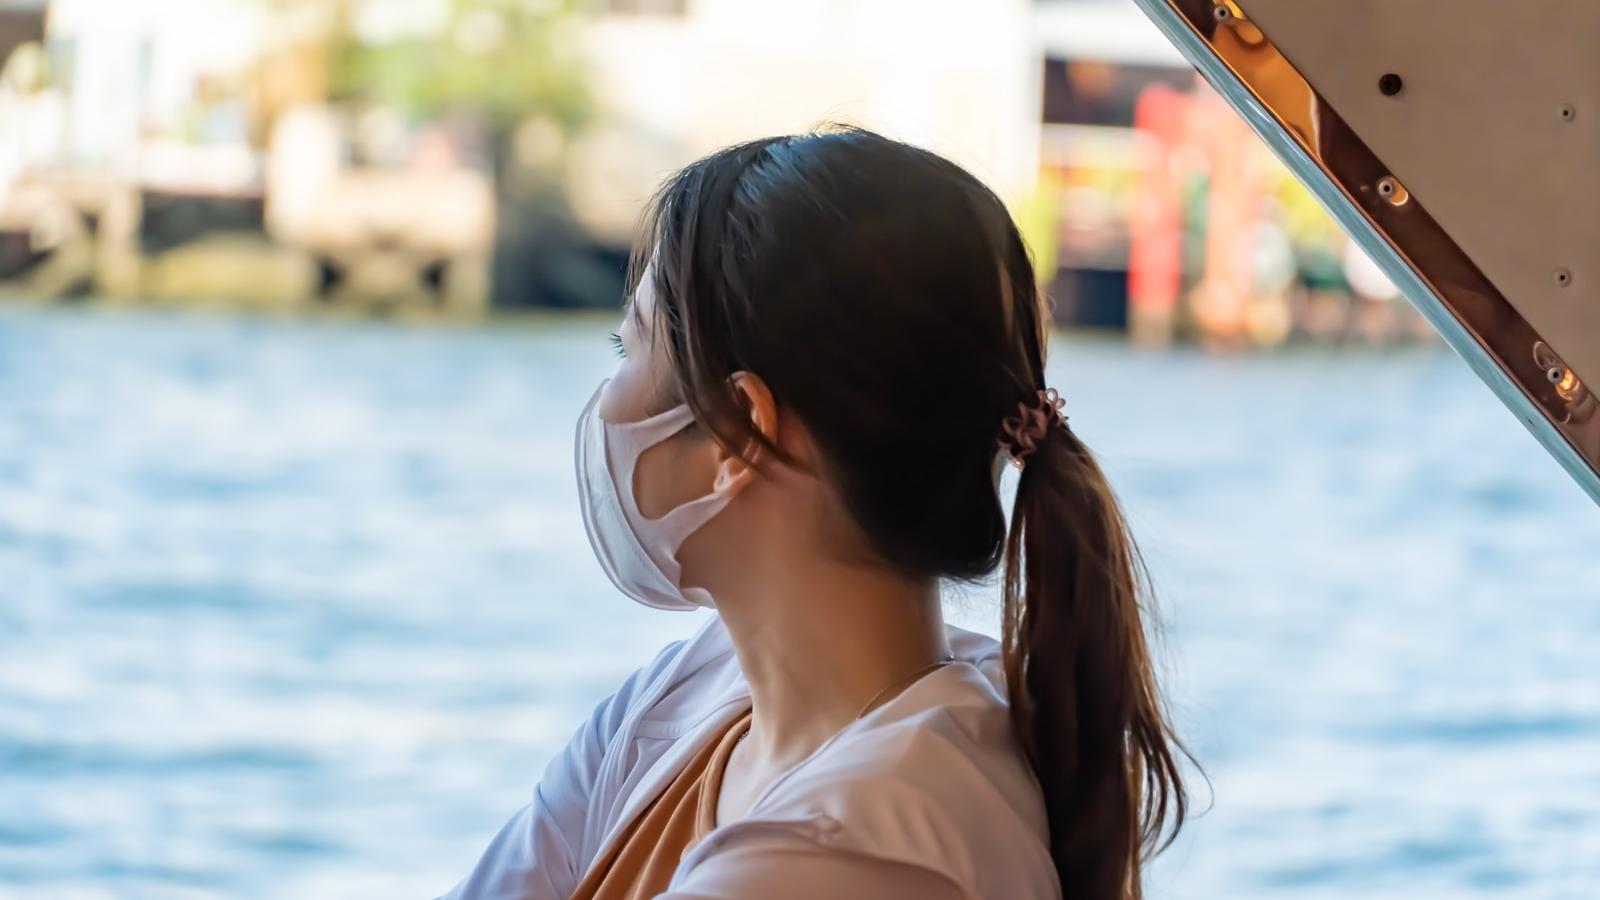 woman in white shirt wearing white sunglasses